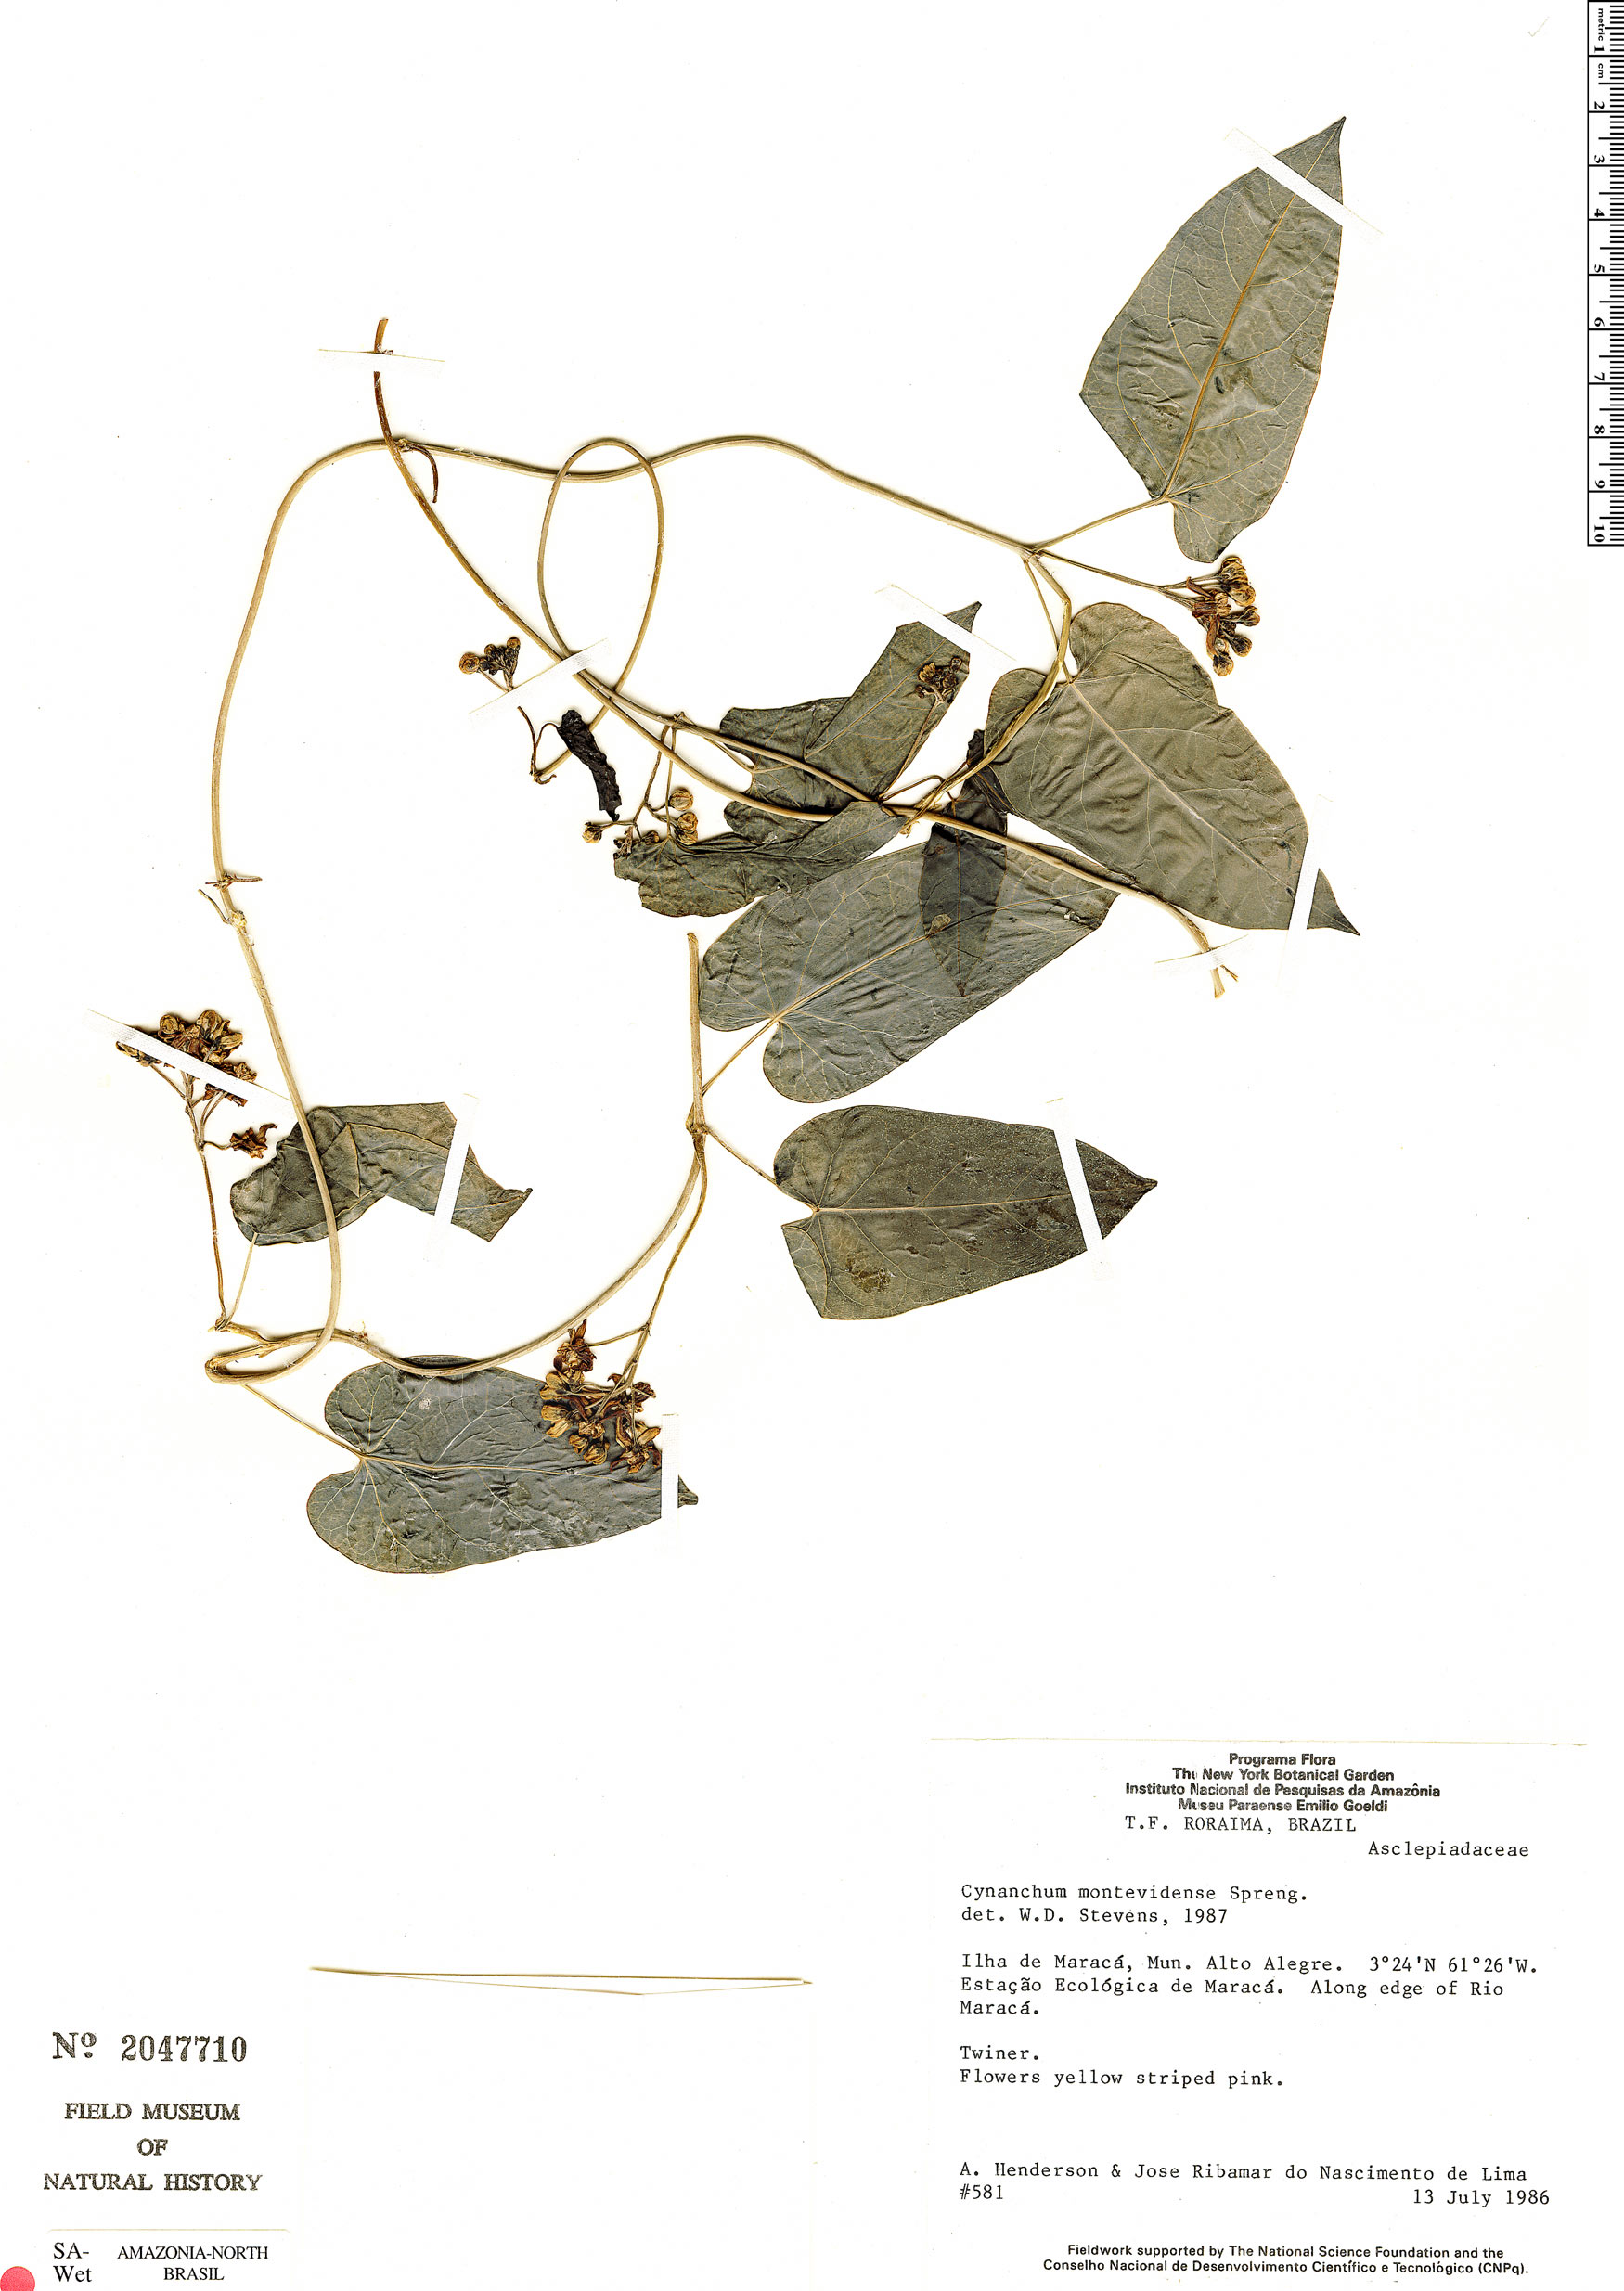 Specimen: Cynanchum montevidense